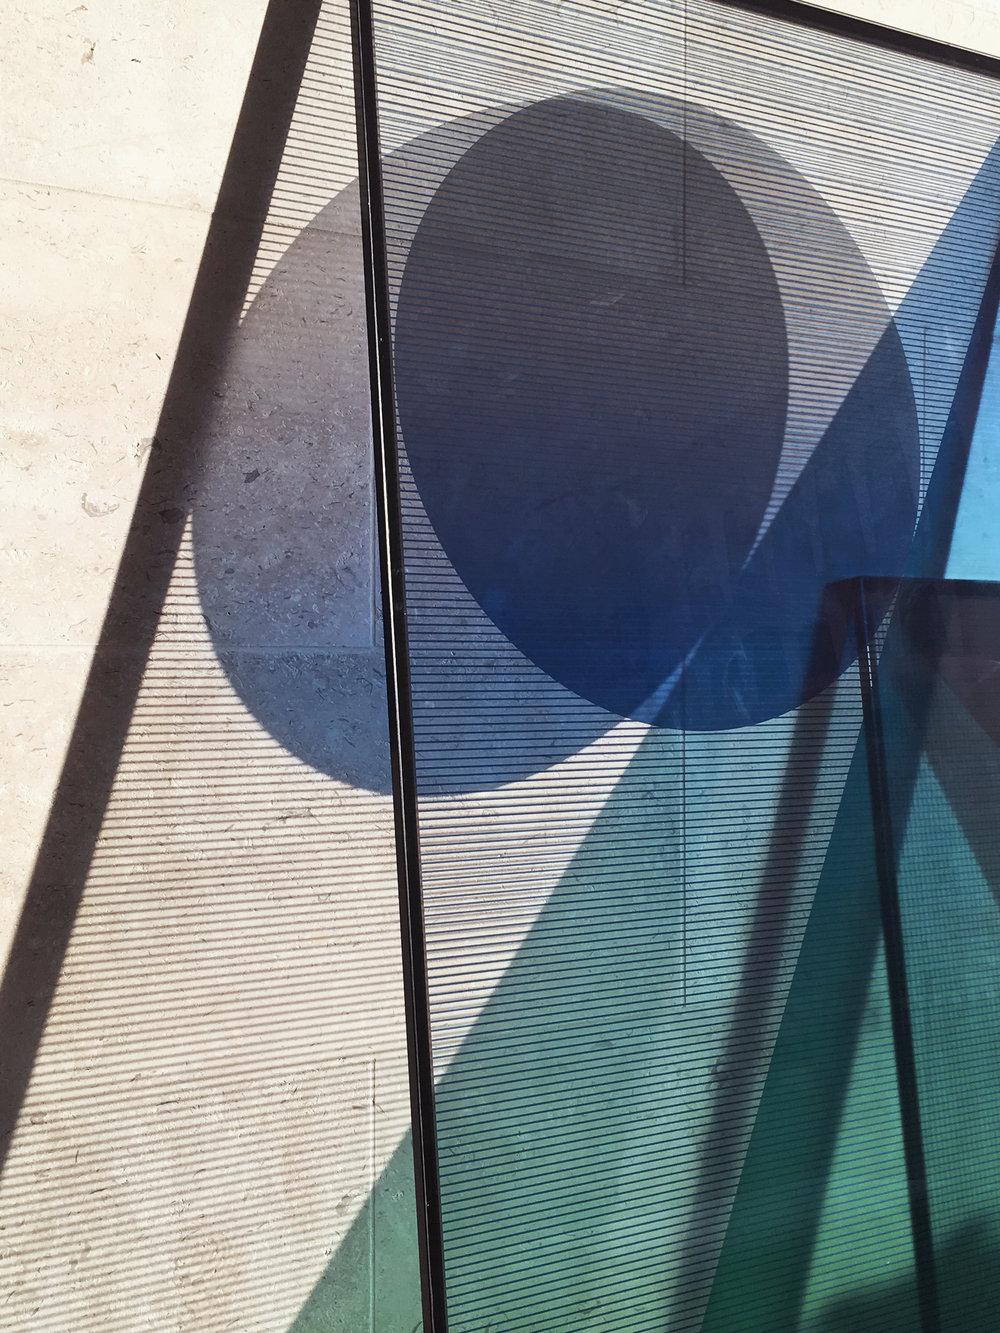 MOCT_Cannon Street_installation_01.jpg